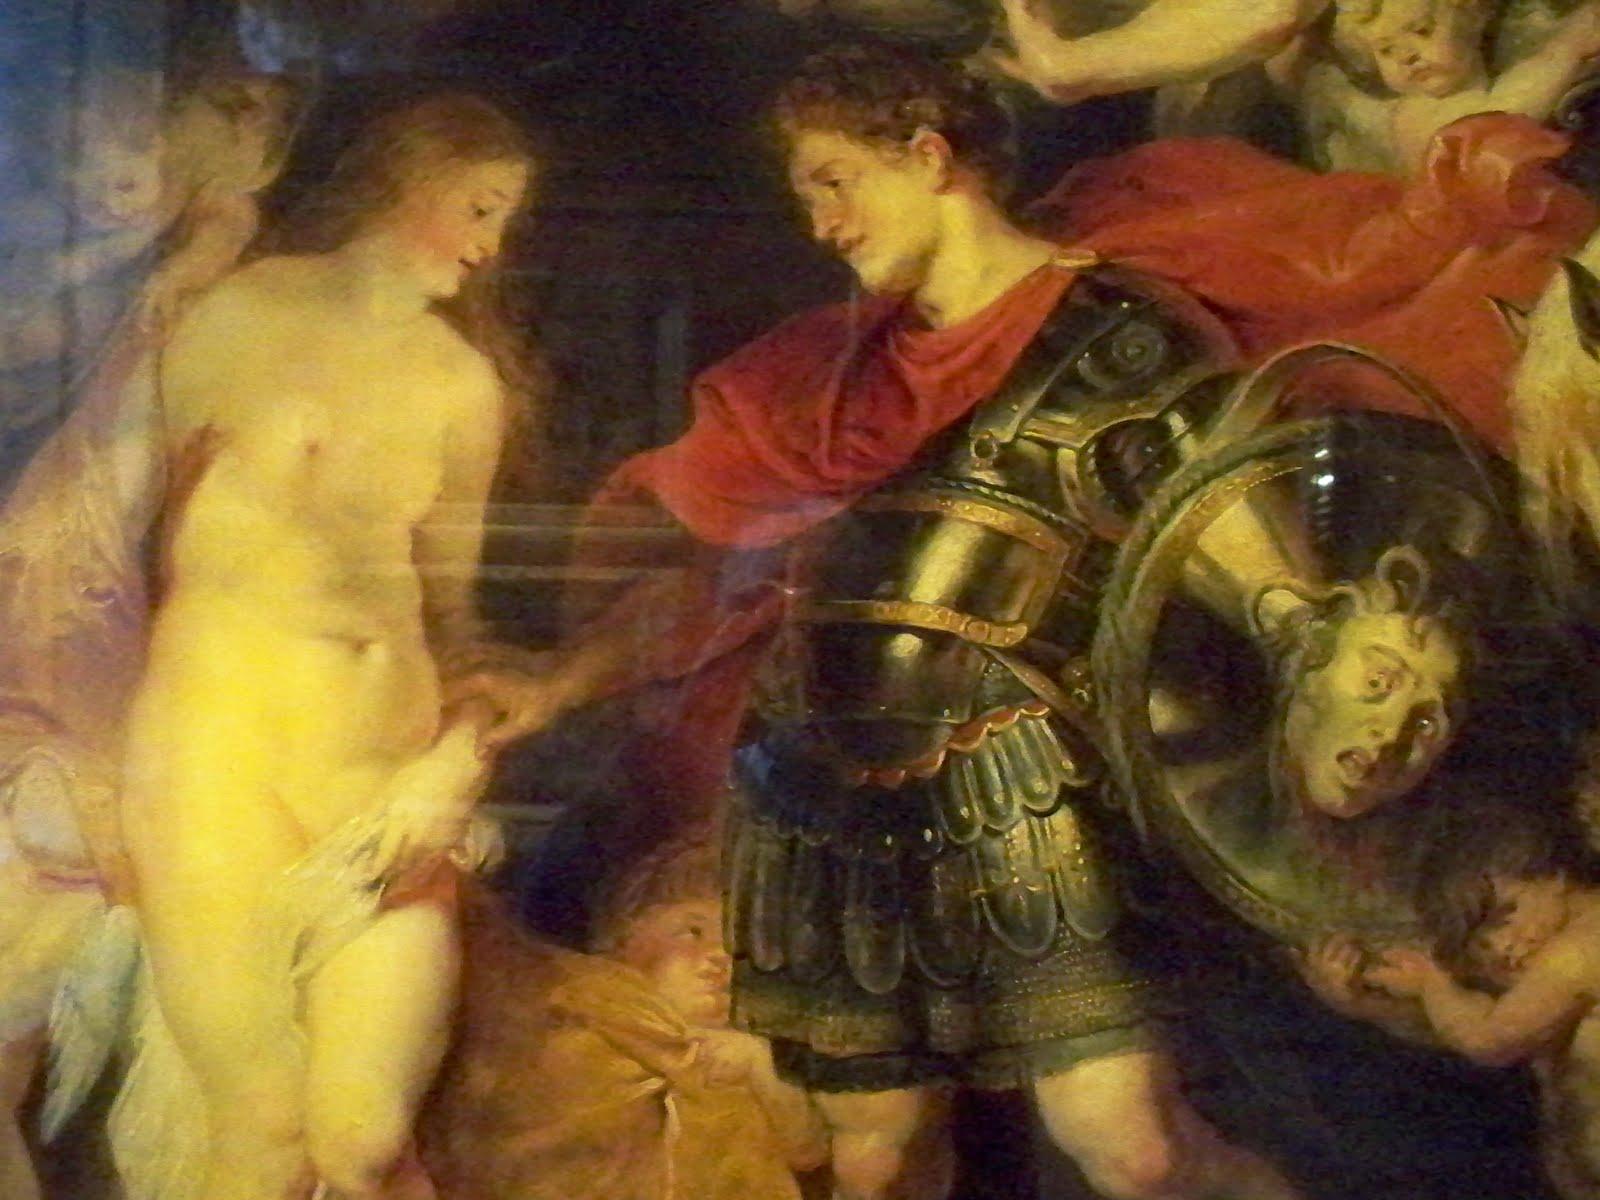 http://1.bp.blogspot.com/_RIhpOKswlxE/SxAryNJGfeI/AAAAAAAAAkg/FgmZa9YeBlc/s1600/Rubens+4+Perseus+Andromeda+Medusa.JPG